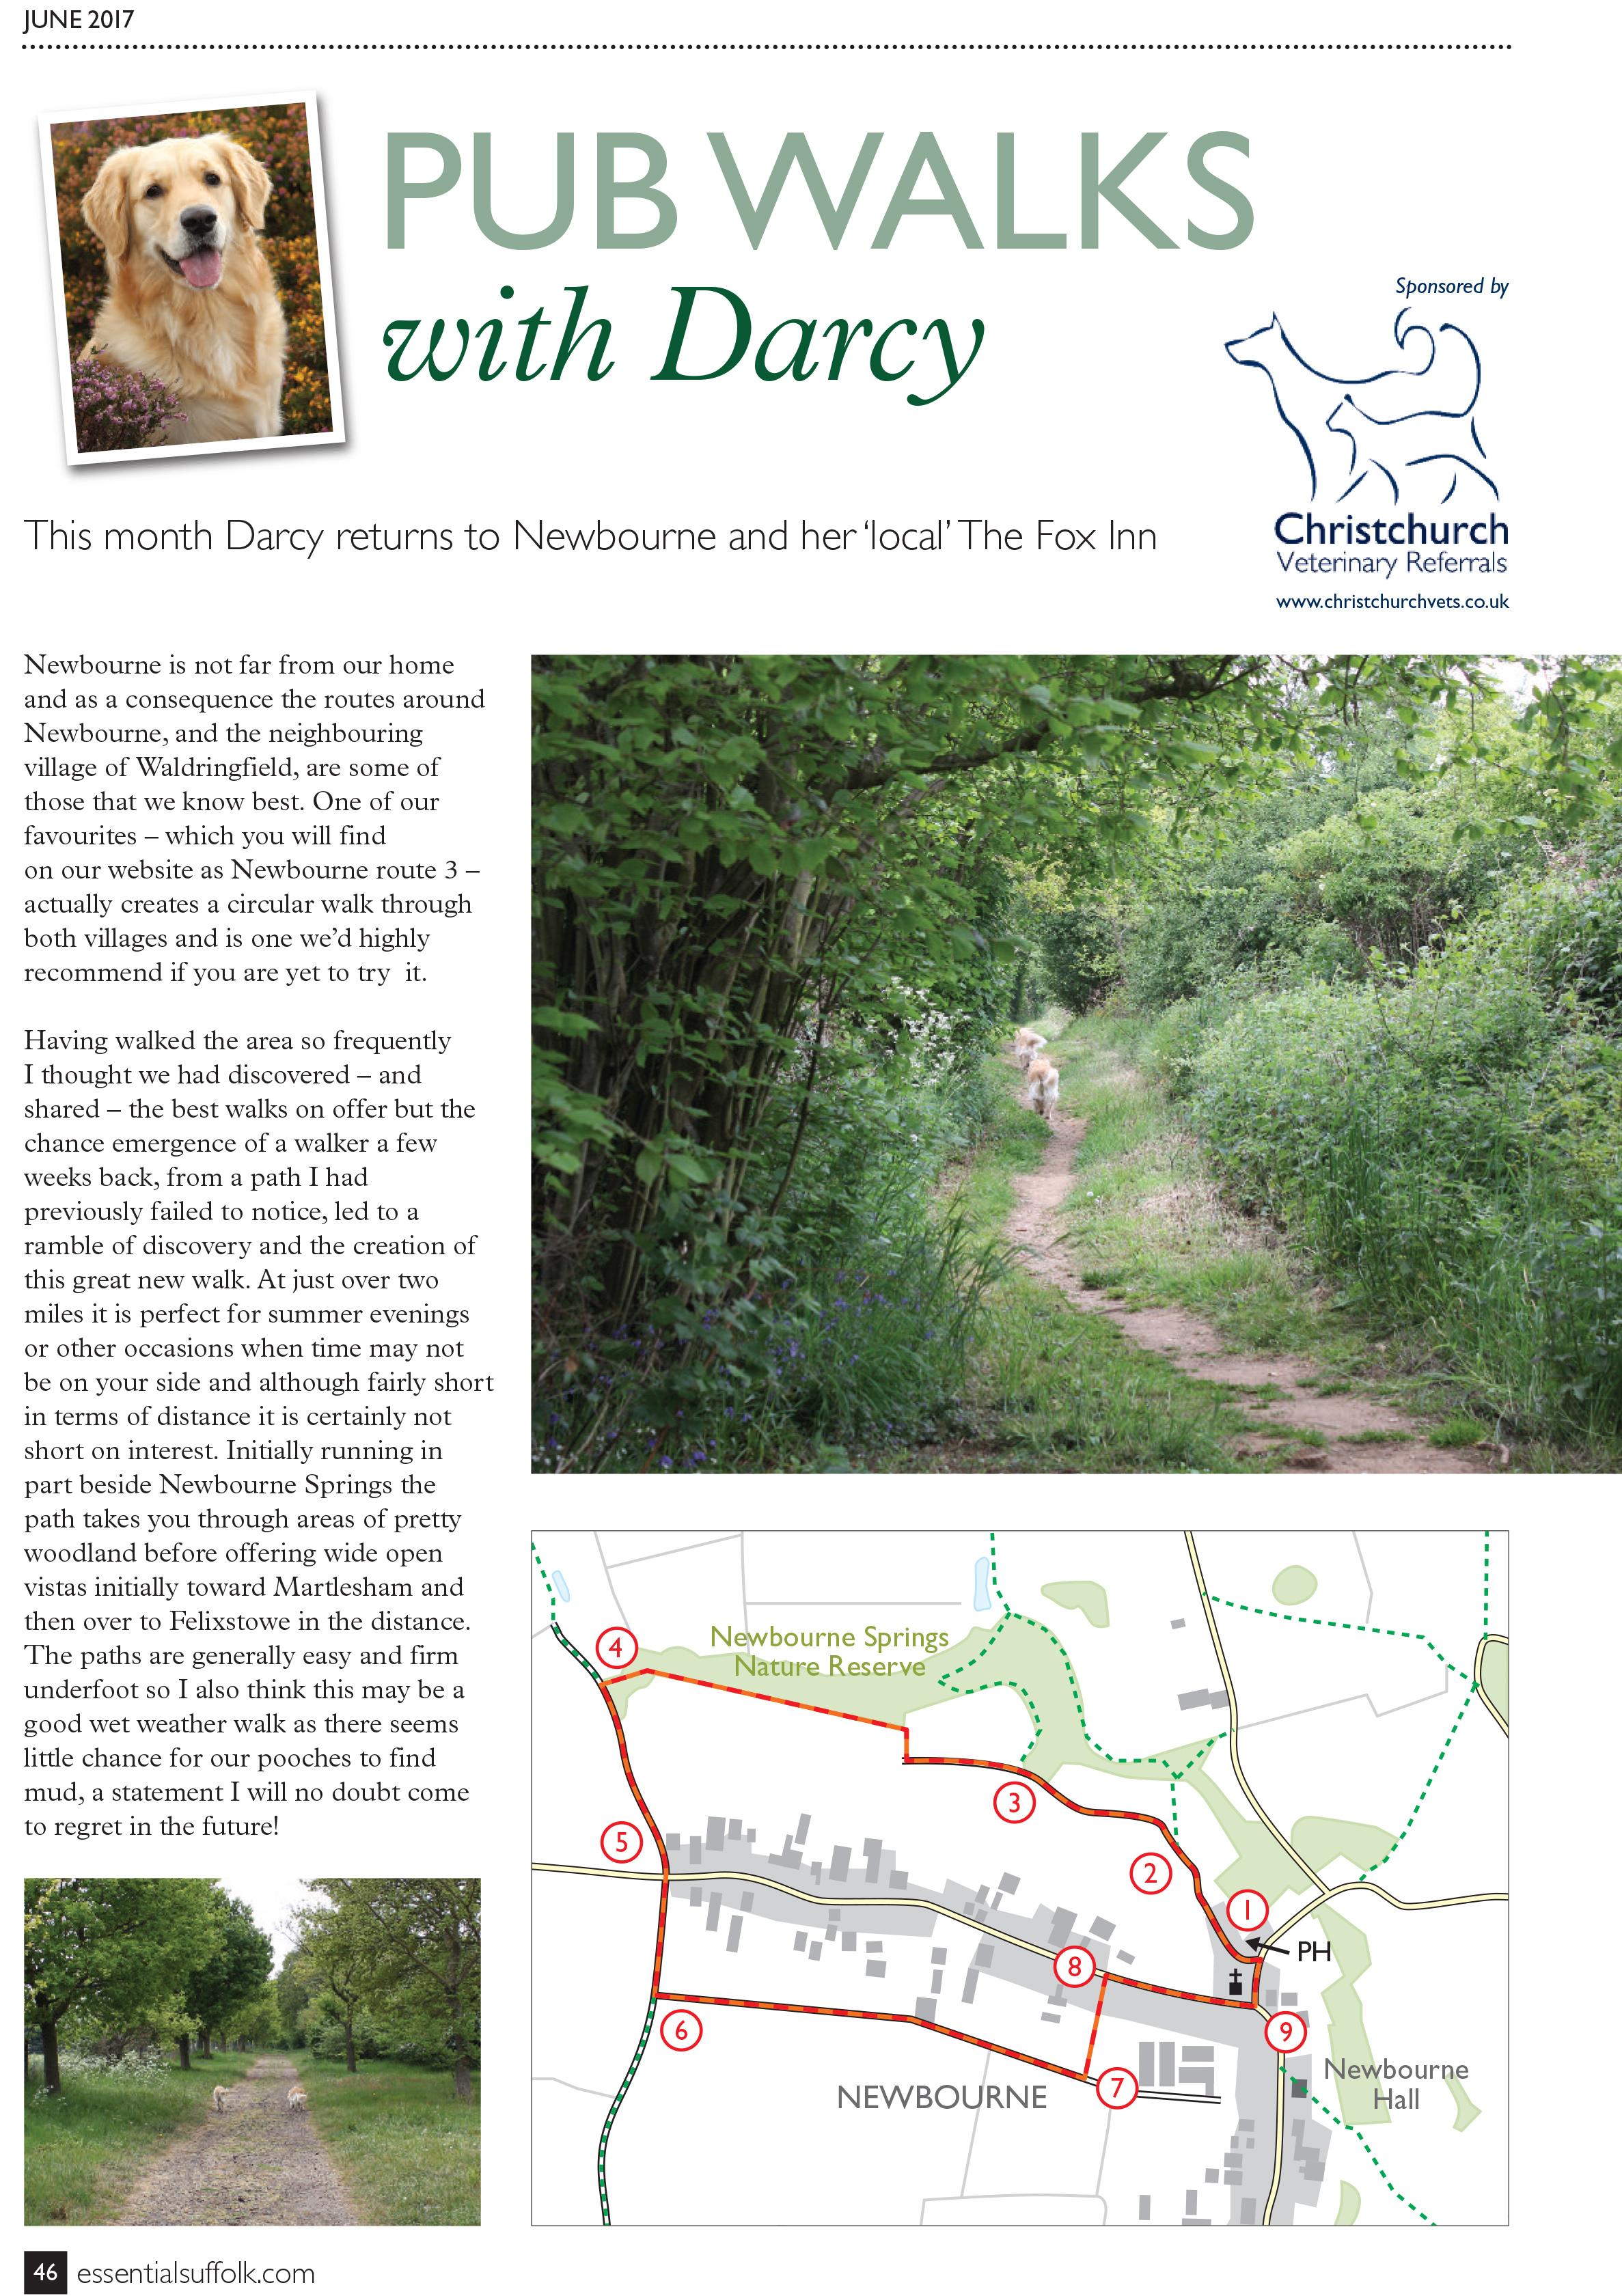 Newbourne Dog Walk route 4 page 1